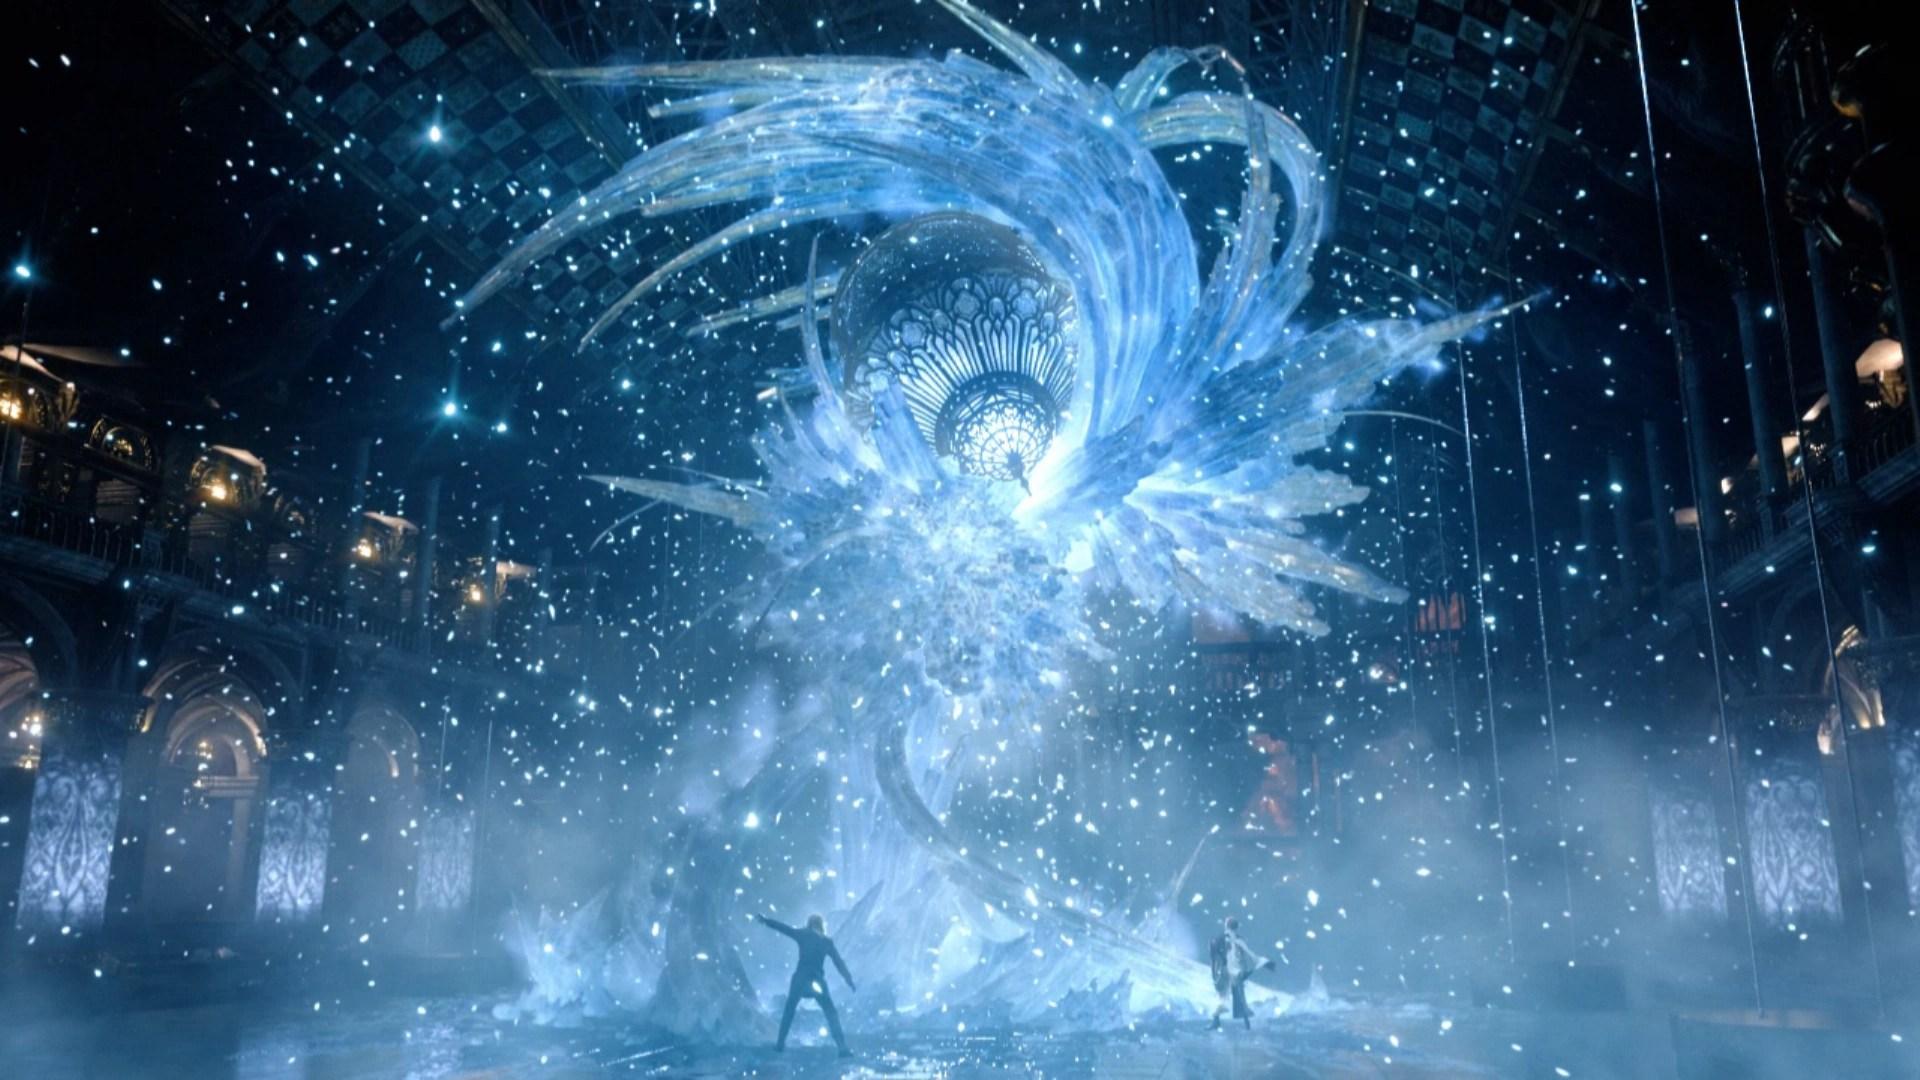 Wallpaper Engine Girl Falling Music Crystal Pillar Final Fantasy Xiii The Final Fantasy